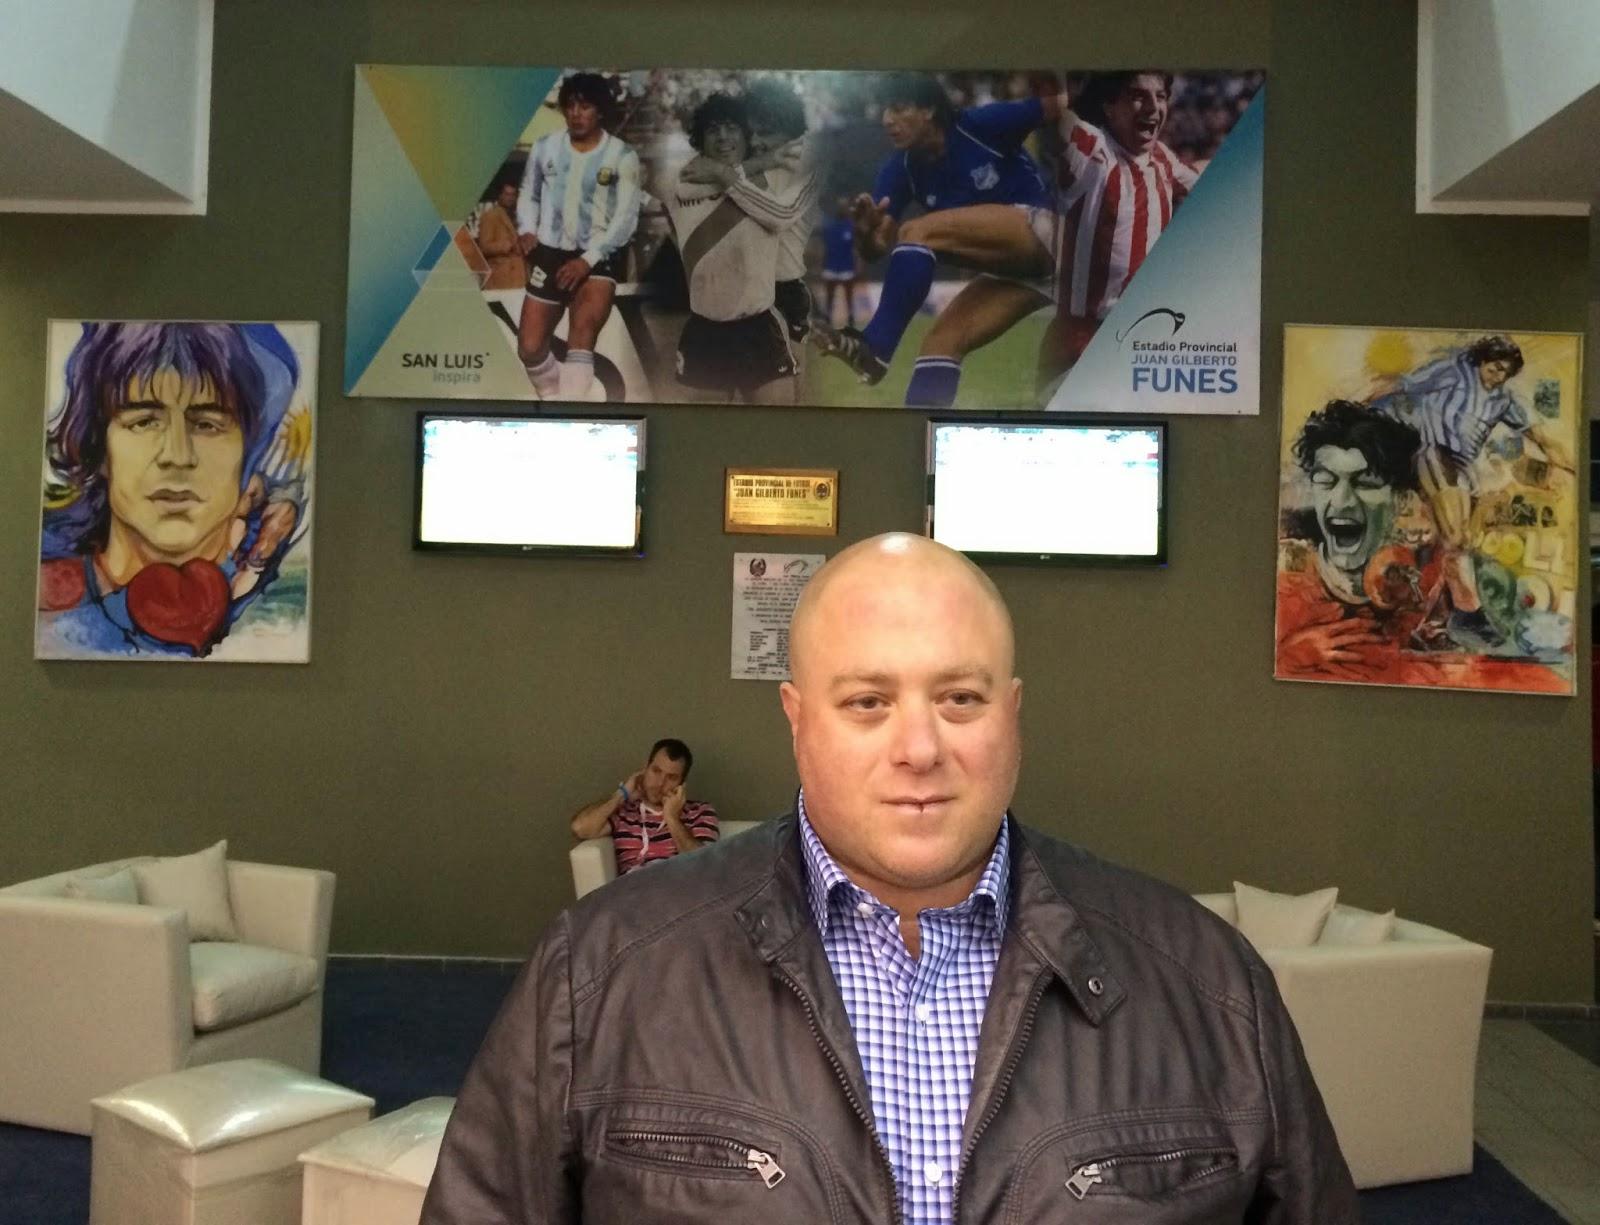 Antonio Caselli, San Luis, Caselli, River, River Plate, Juan Gilberto Funes, Estadio,